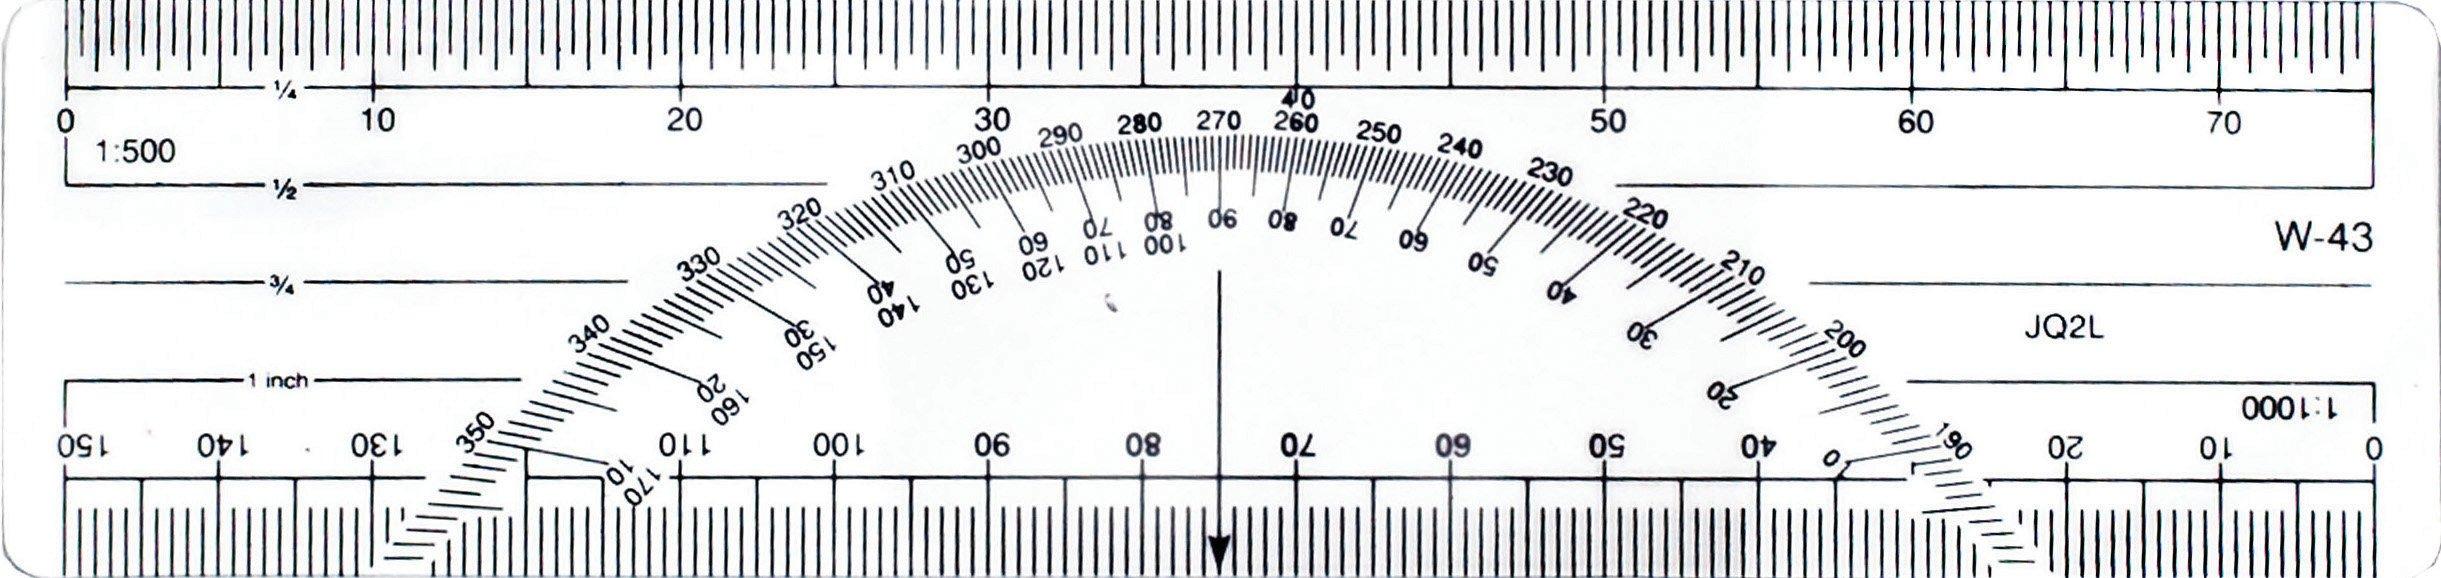 Westcott 6-Inch Metric Protractor Ruler (W-43 BP)